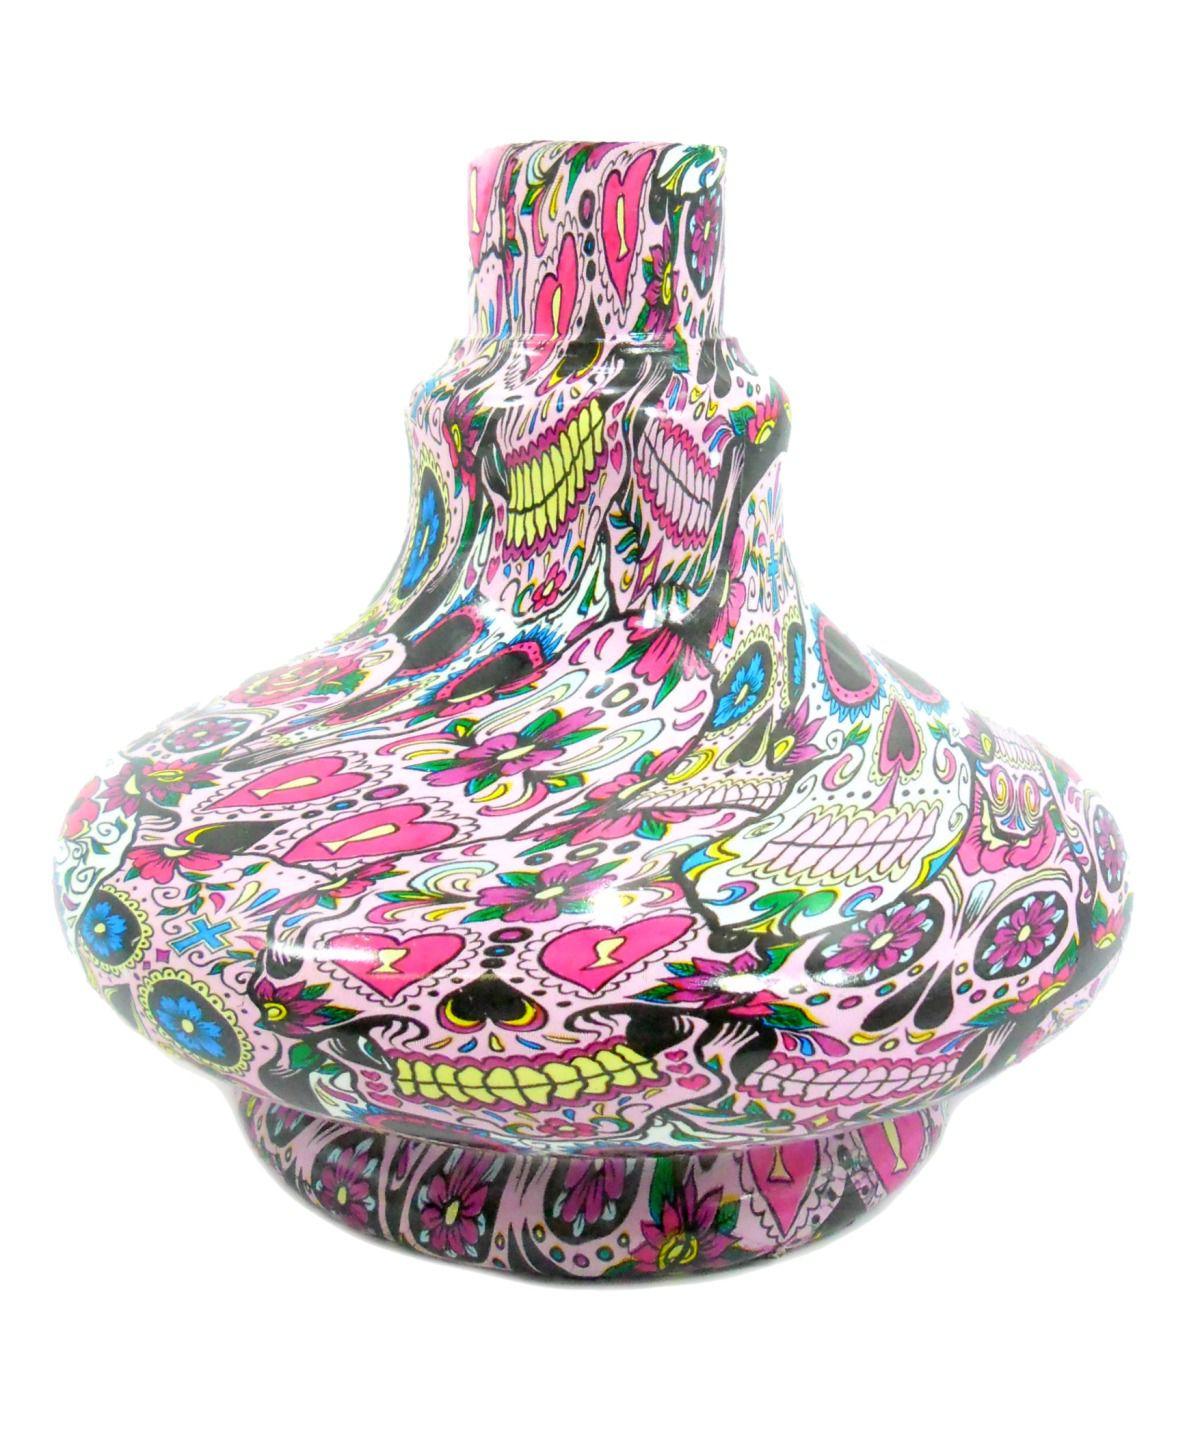 Vaso/base para narguile ALADIN em plástico ESTAMPA HIDROGRÁFICA. 13,5cm alt.; 3,9cm bocal (macho).